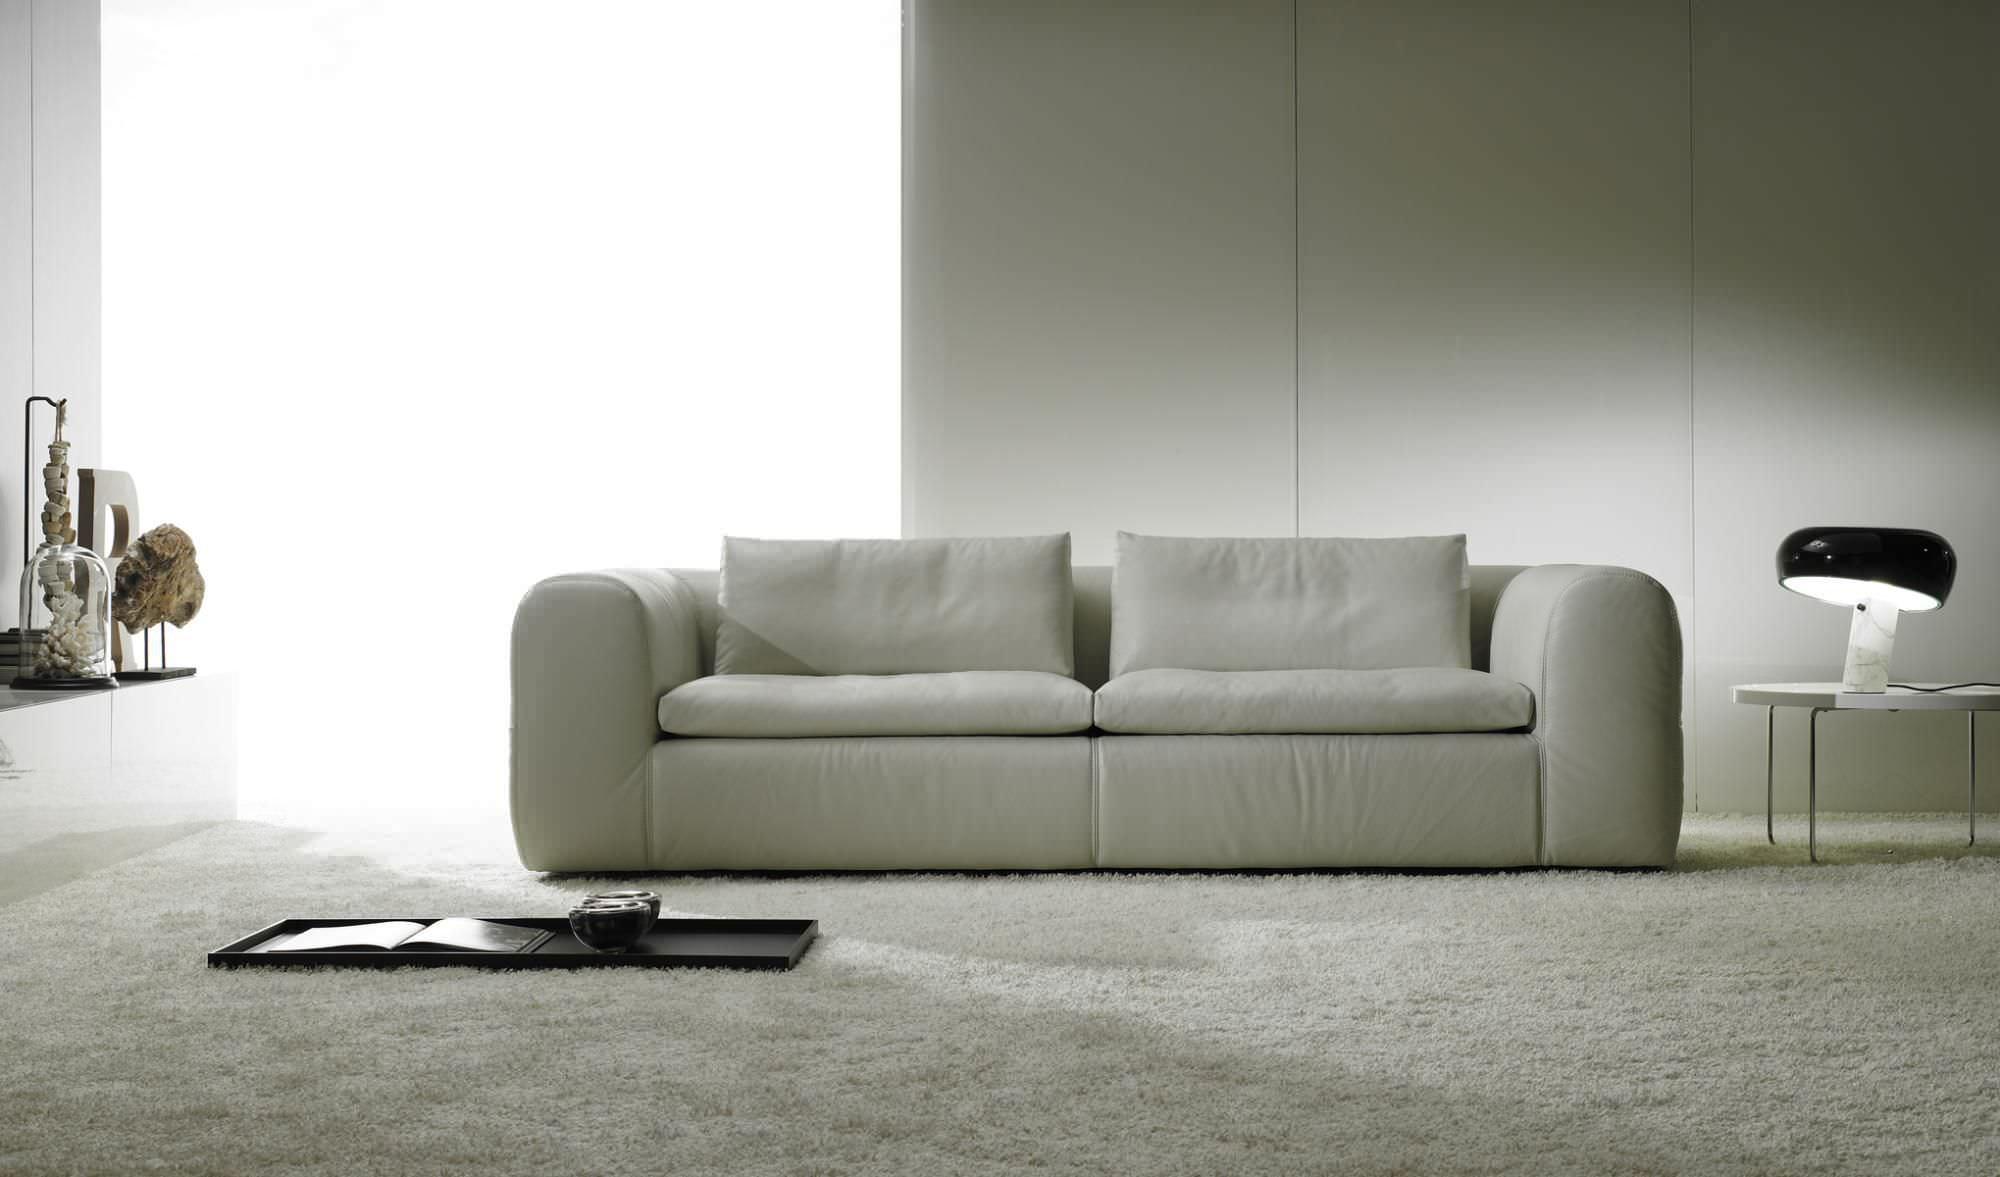 ... Modular Sofa / Corner / Contemporary / Wood SHARPEI By Fabrizio  Ballardini Polaris